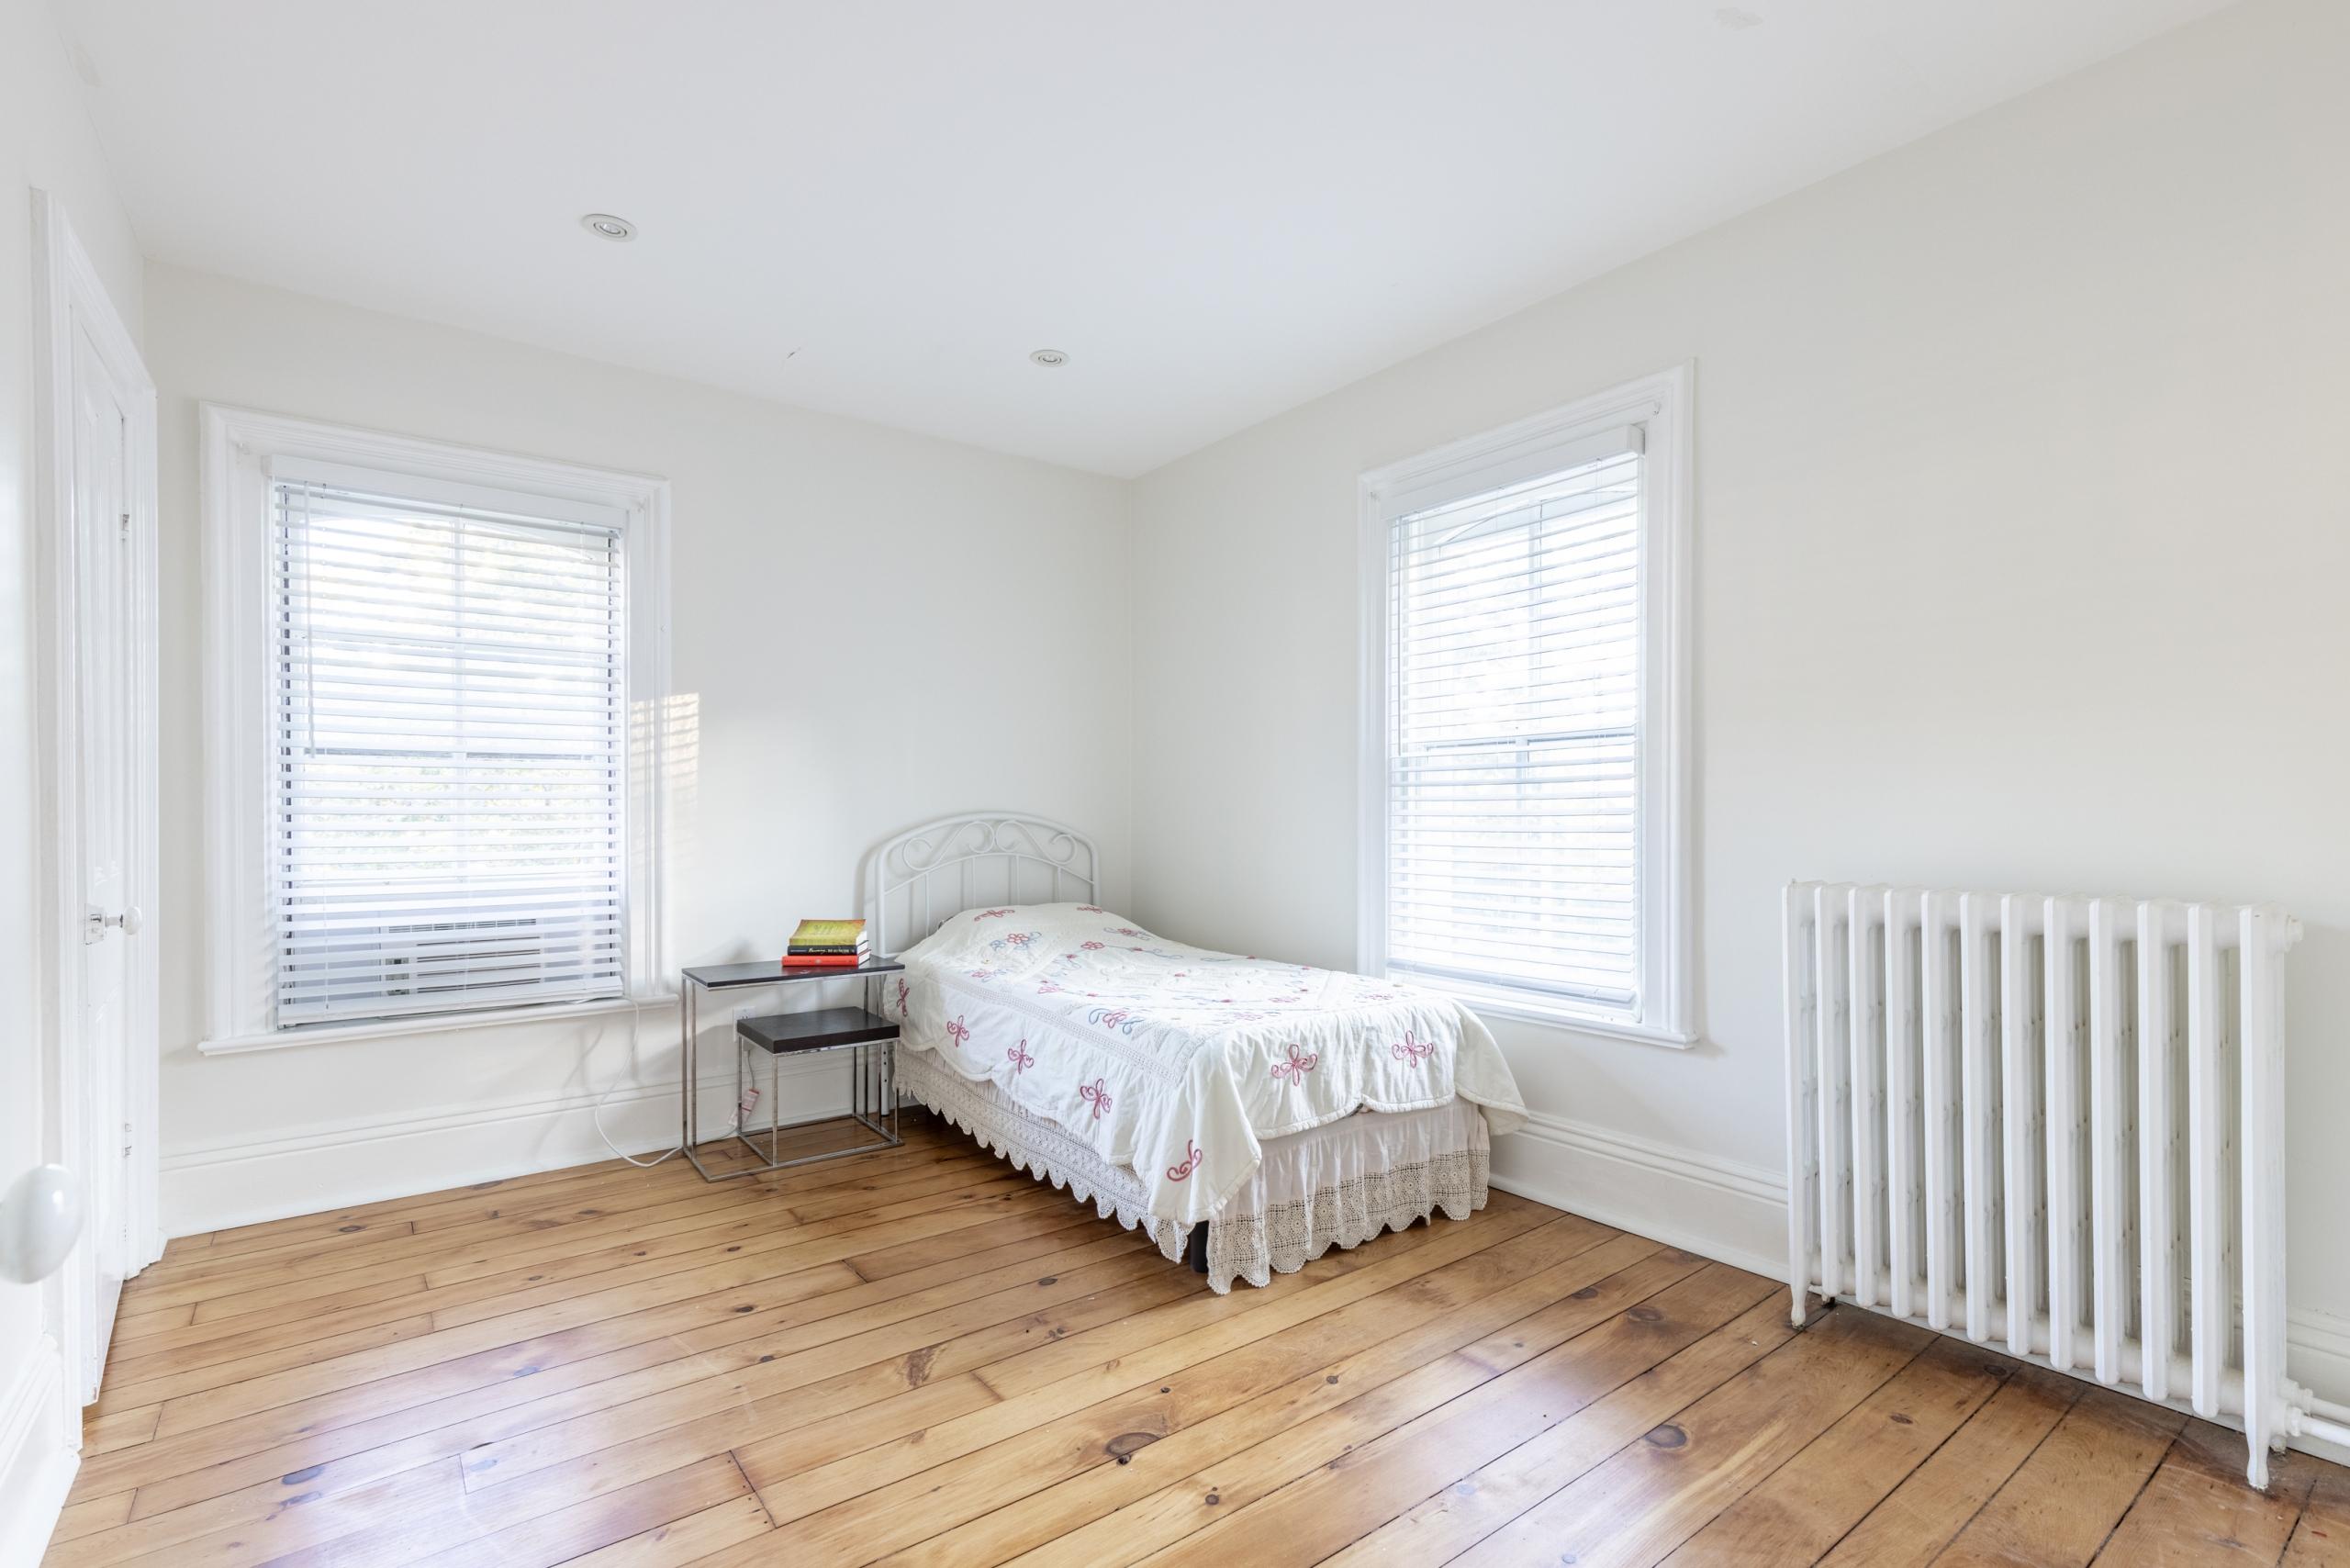 Bedroom featured at 349 Trafalgar Road, Old Oakville, ON at Alex Irish & Associates